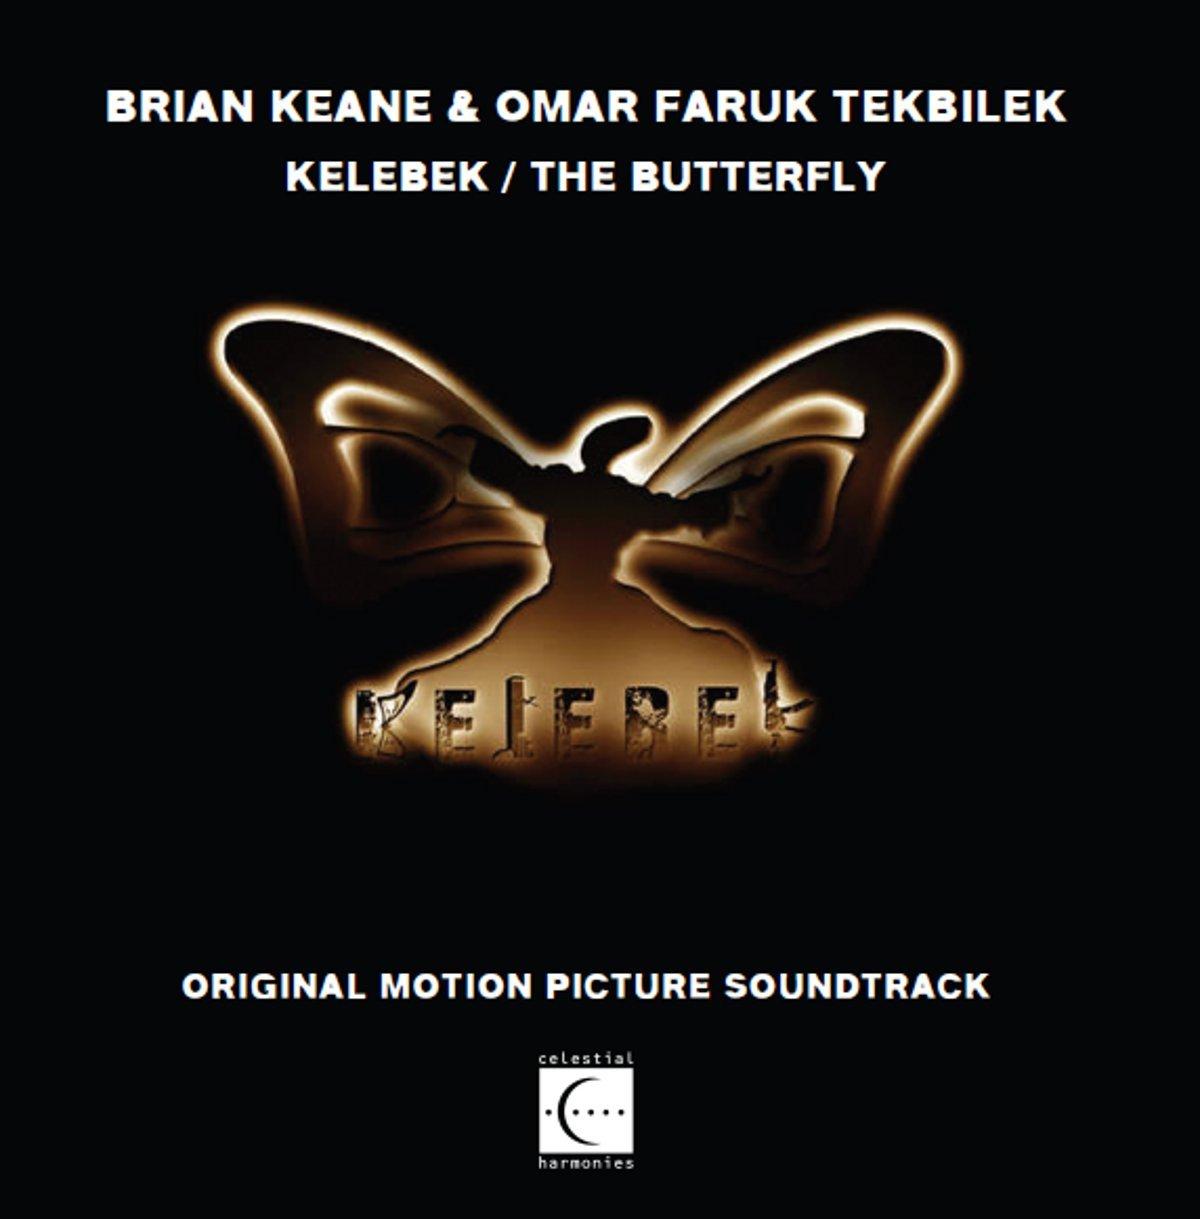 Kelebek / The Butterfly (Original Motion Picture Soundtrack)